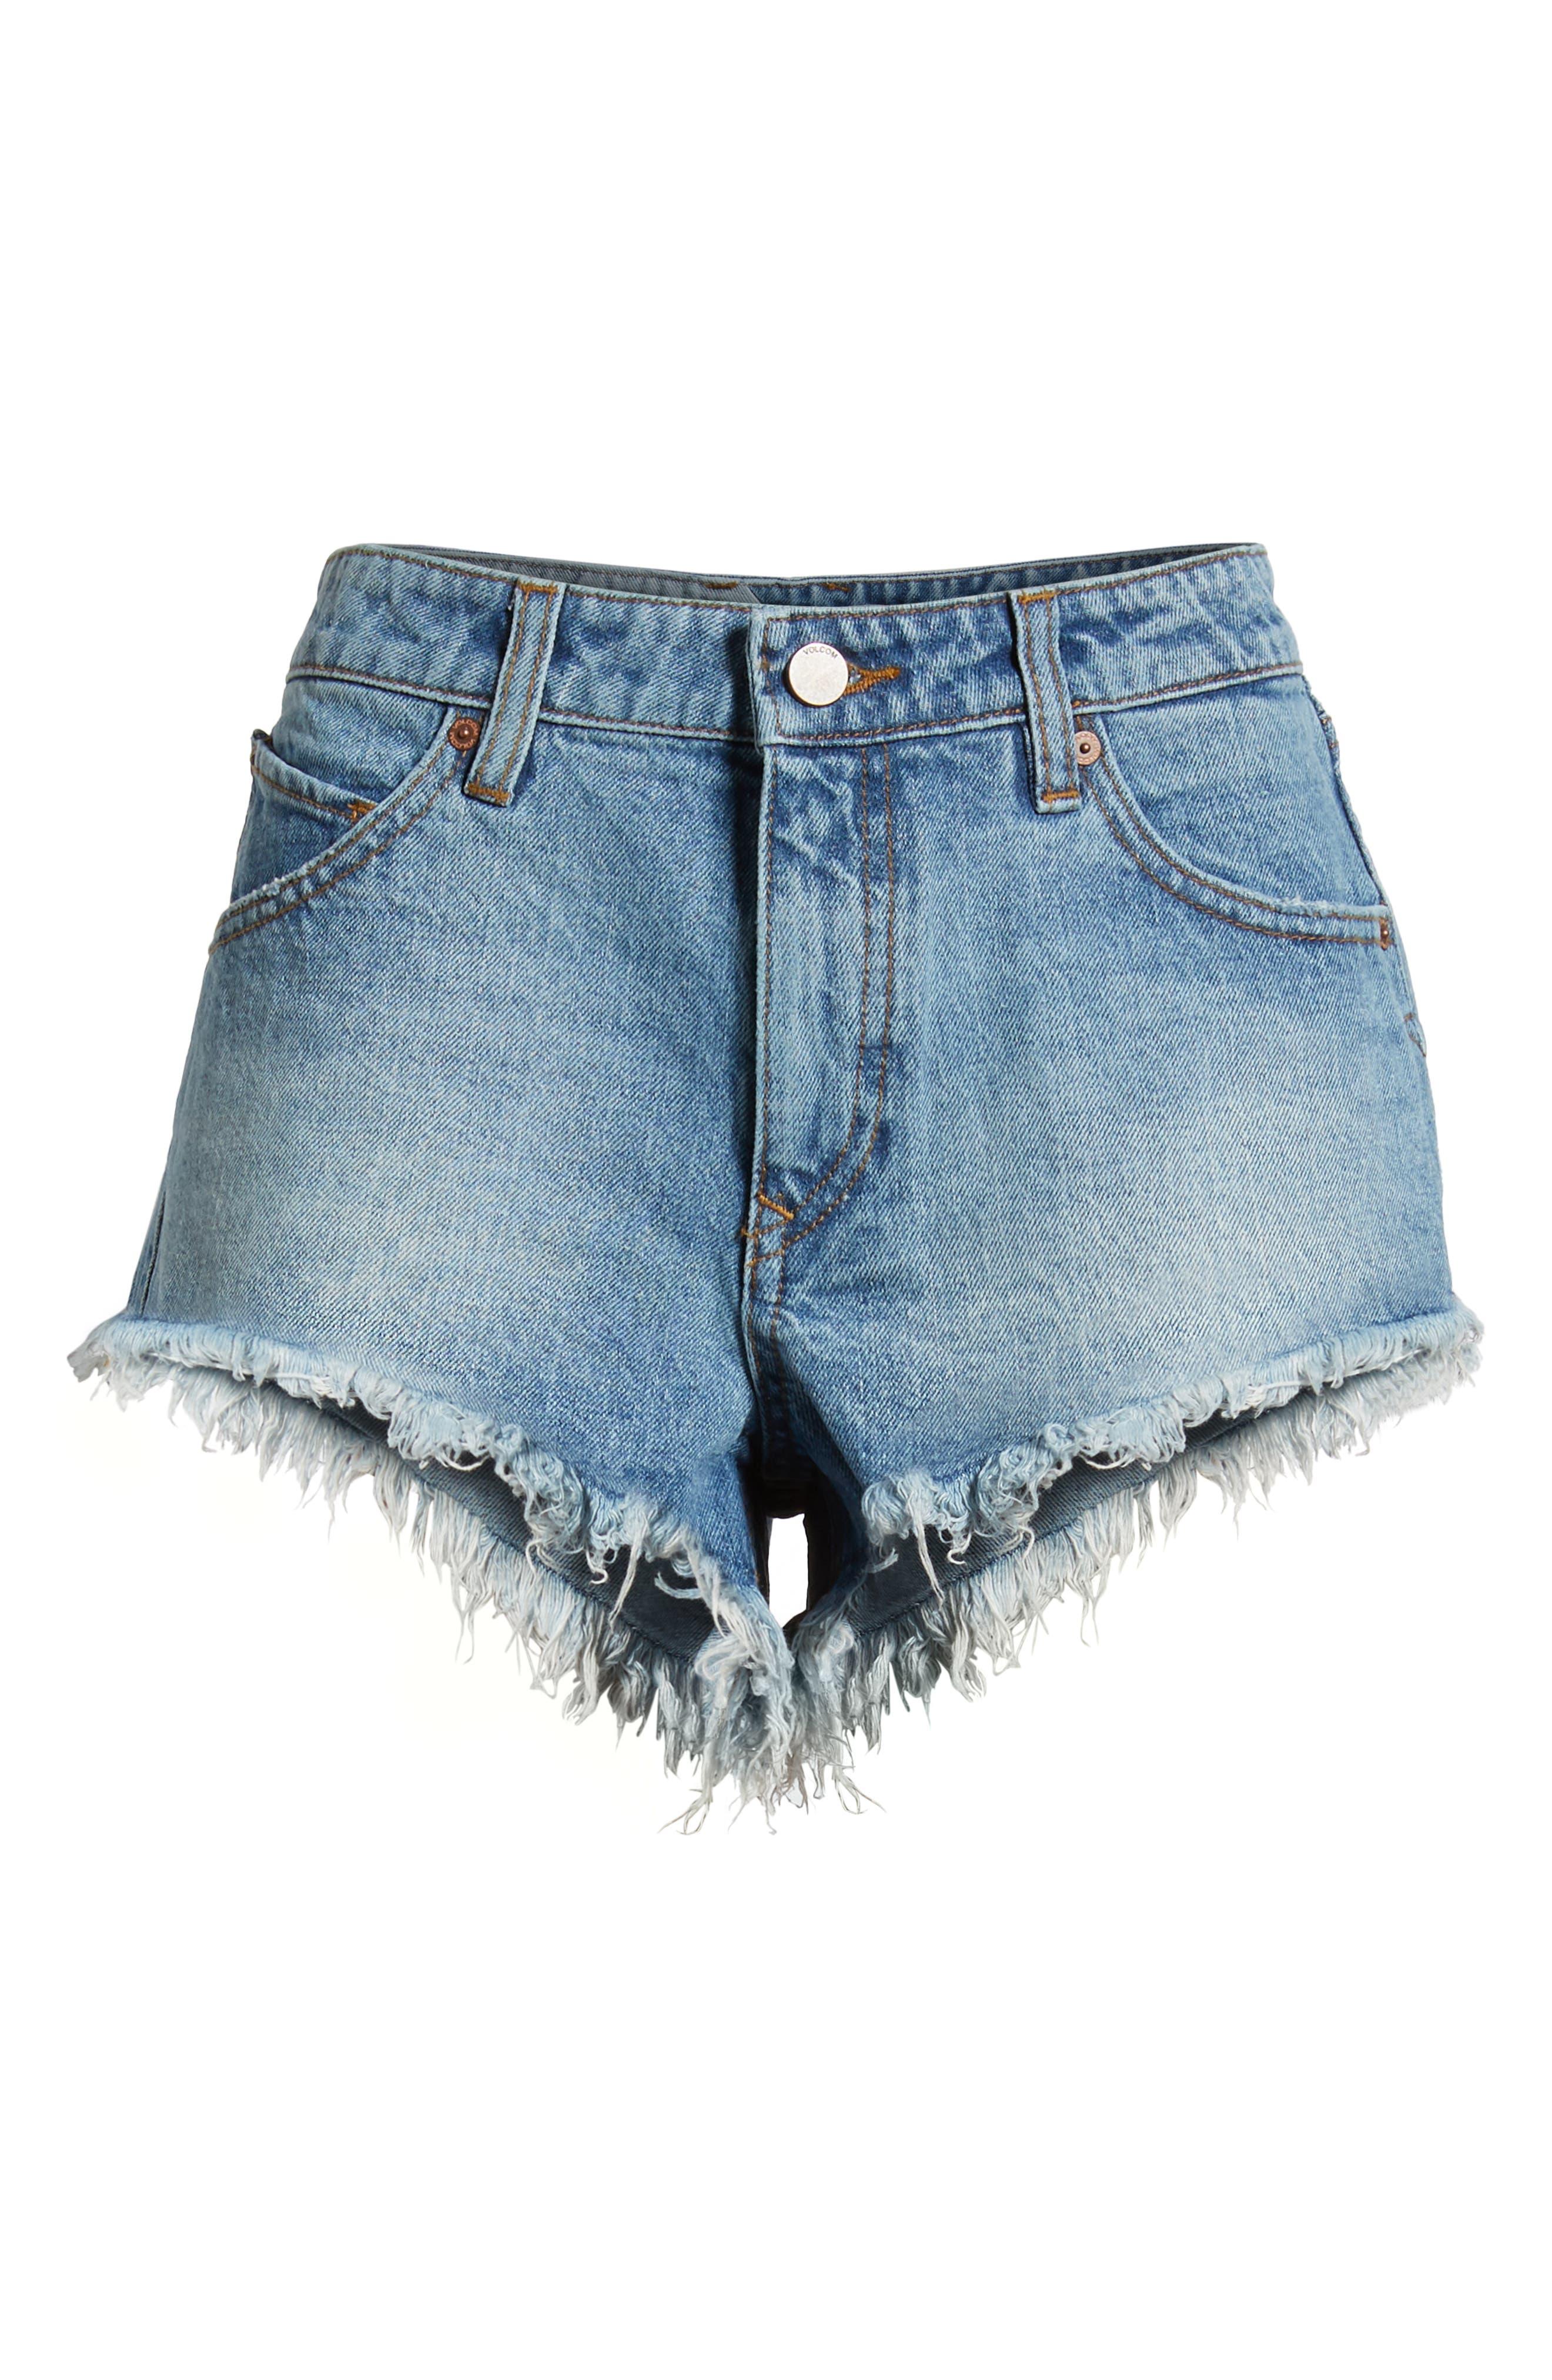 Stoney Cutoff Denim Shorts,                             Alternate thumbnail 7, color,                             BAJA INDIGO